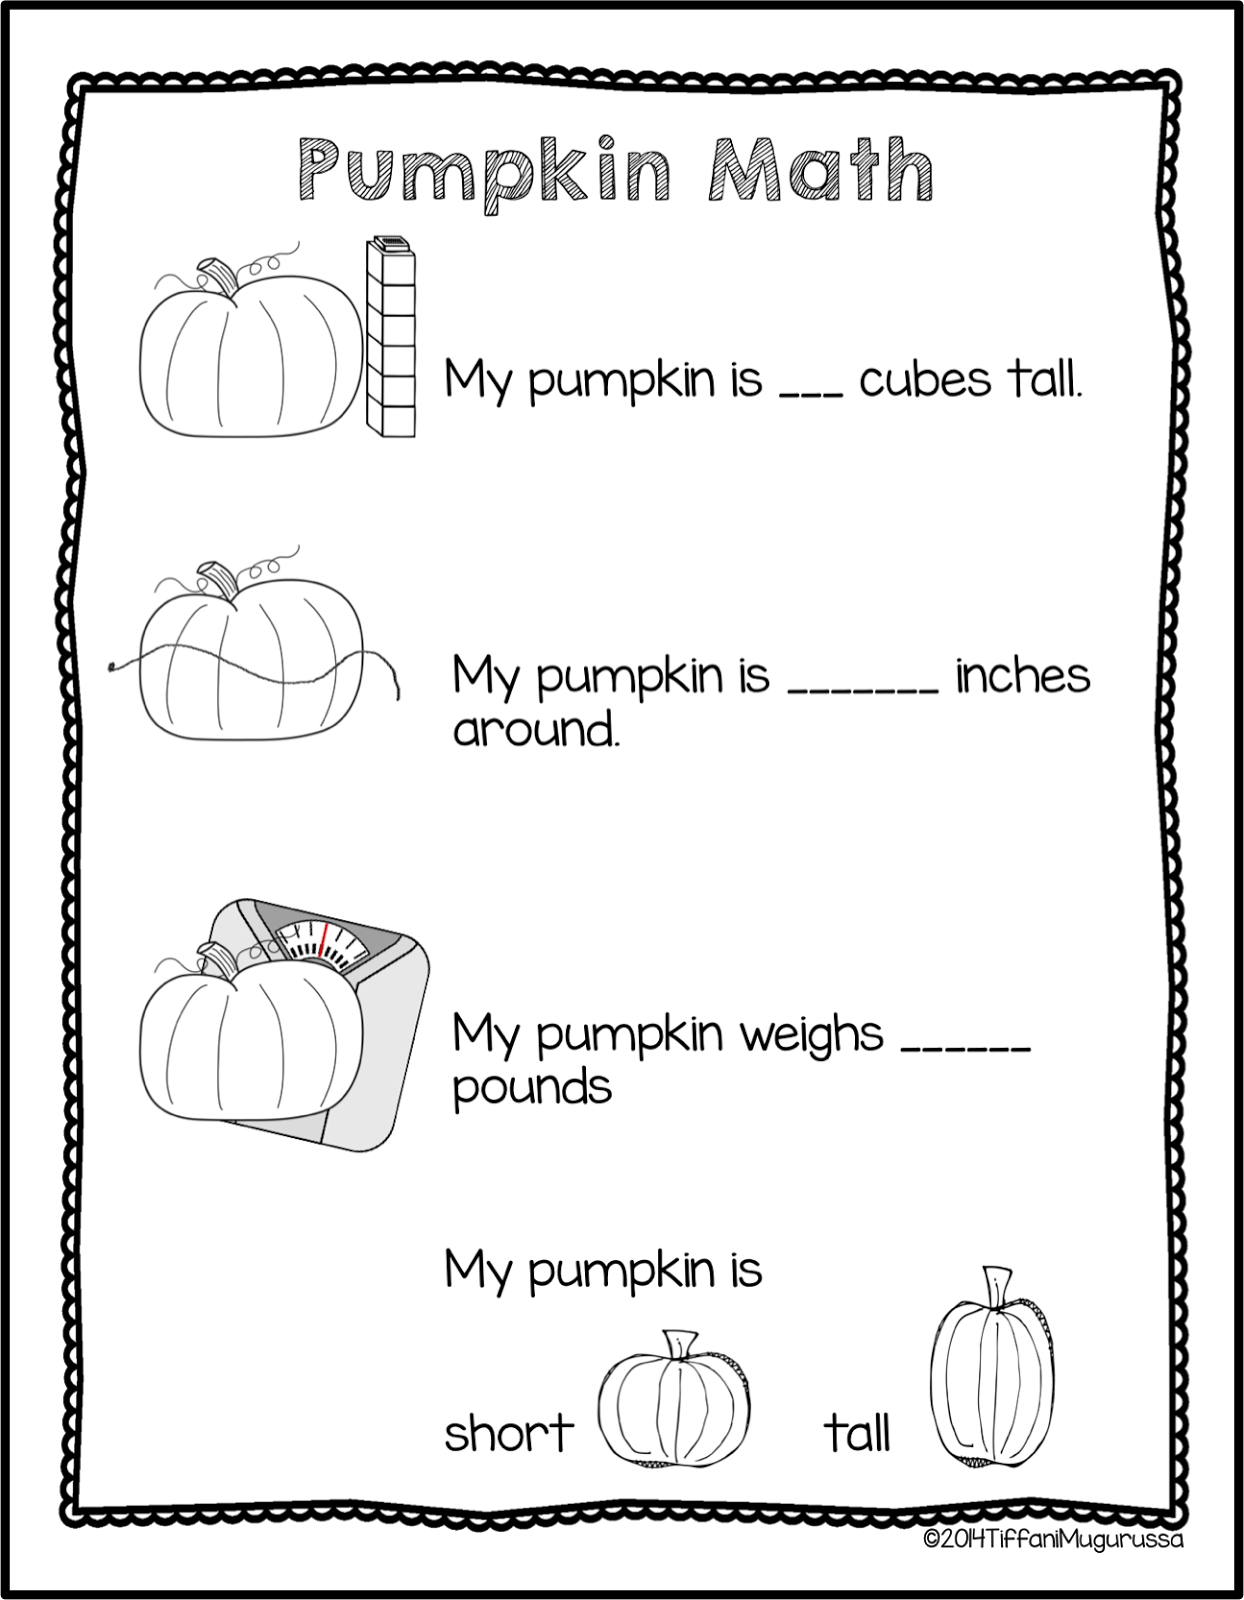 Last Bits Of October Pumpkin Math Activities Pumpkin Lessons Pumpkin Math